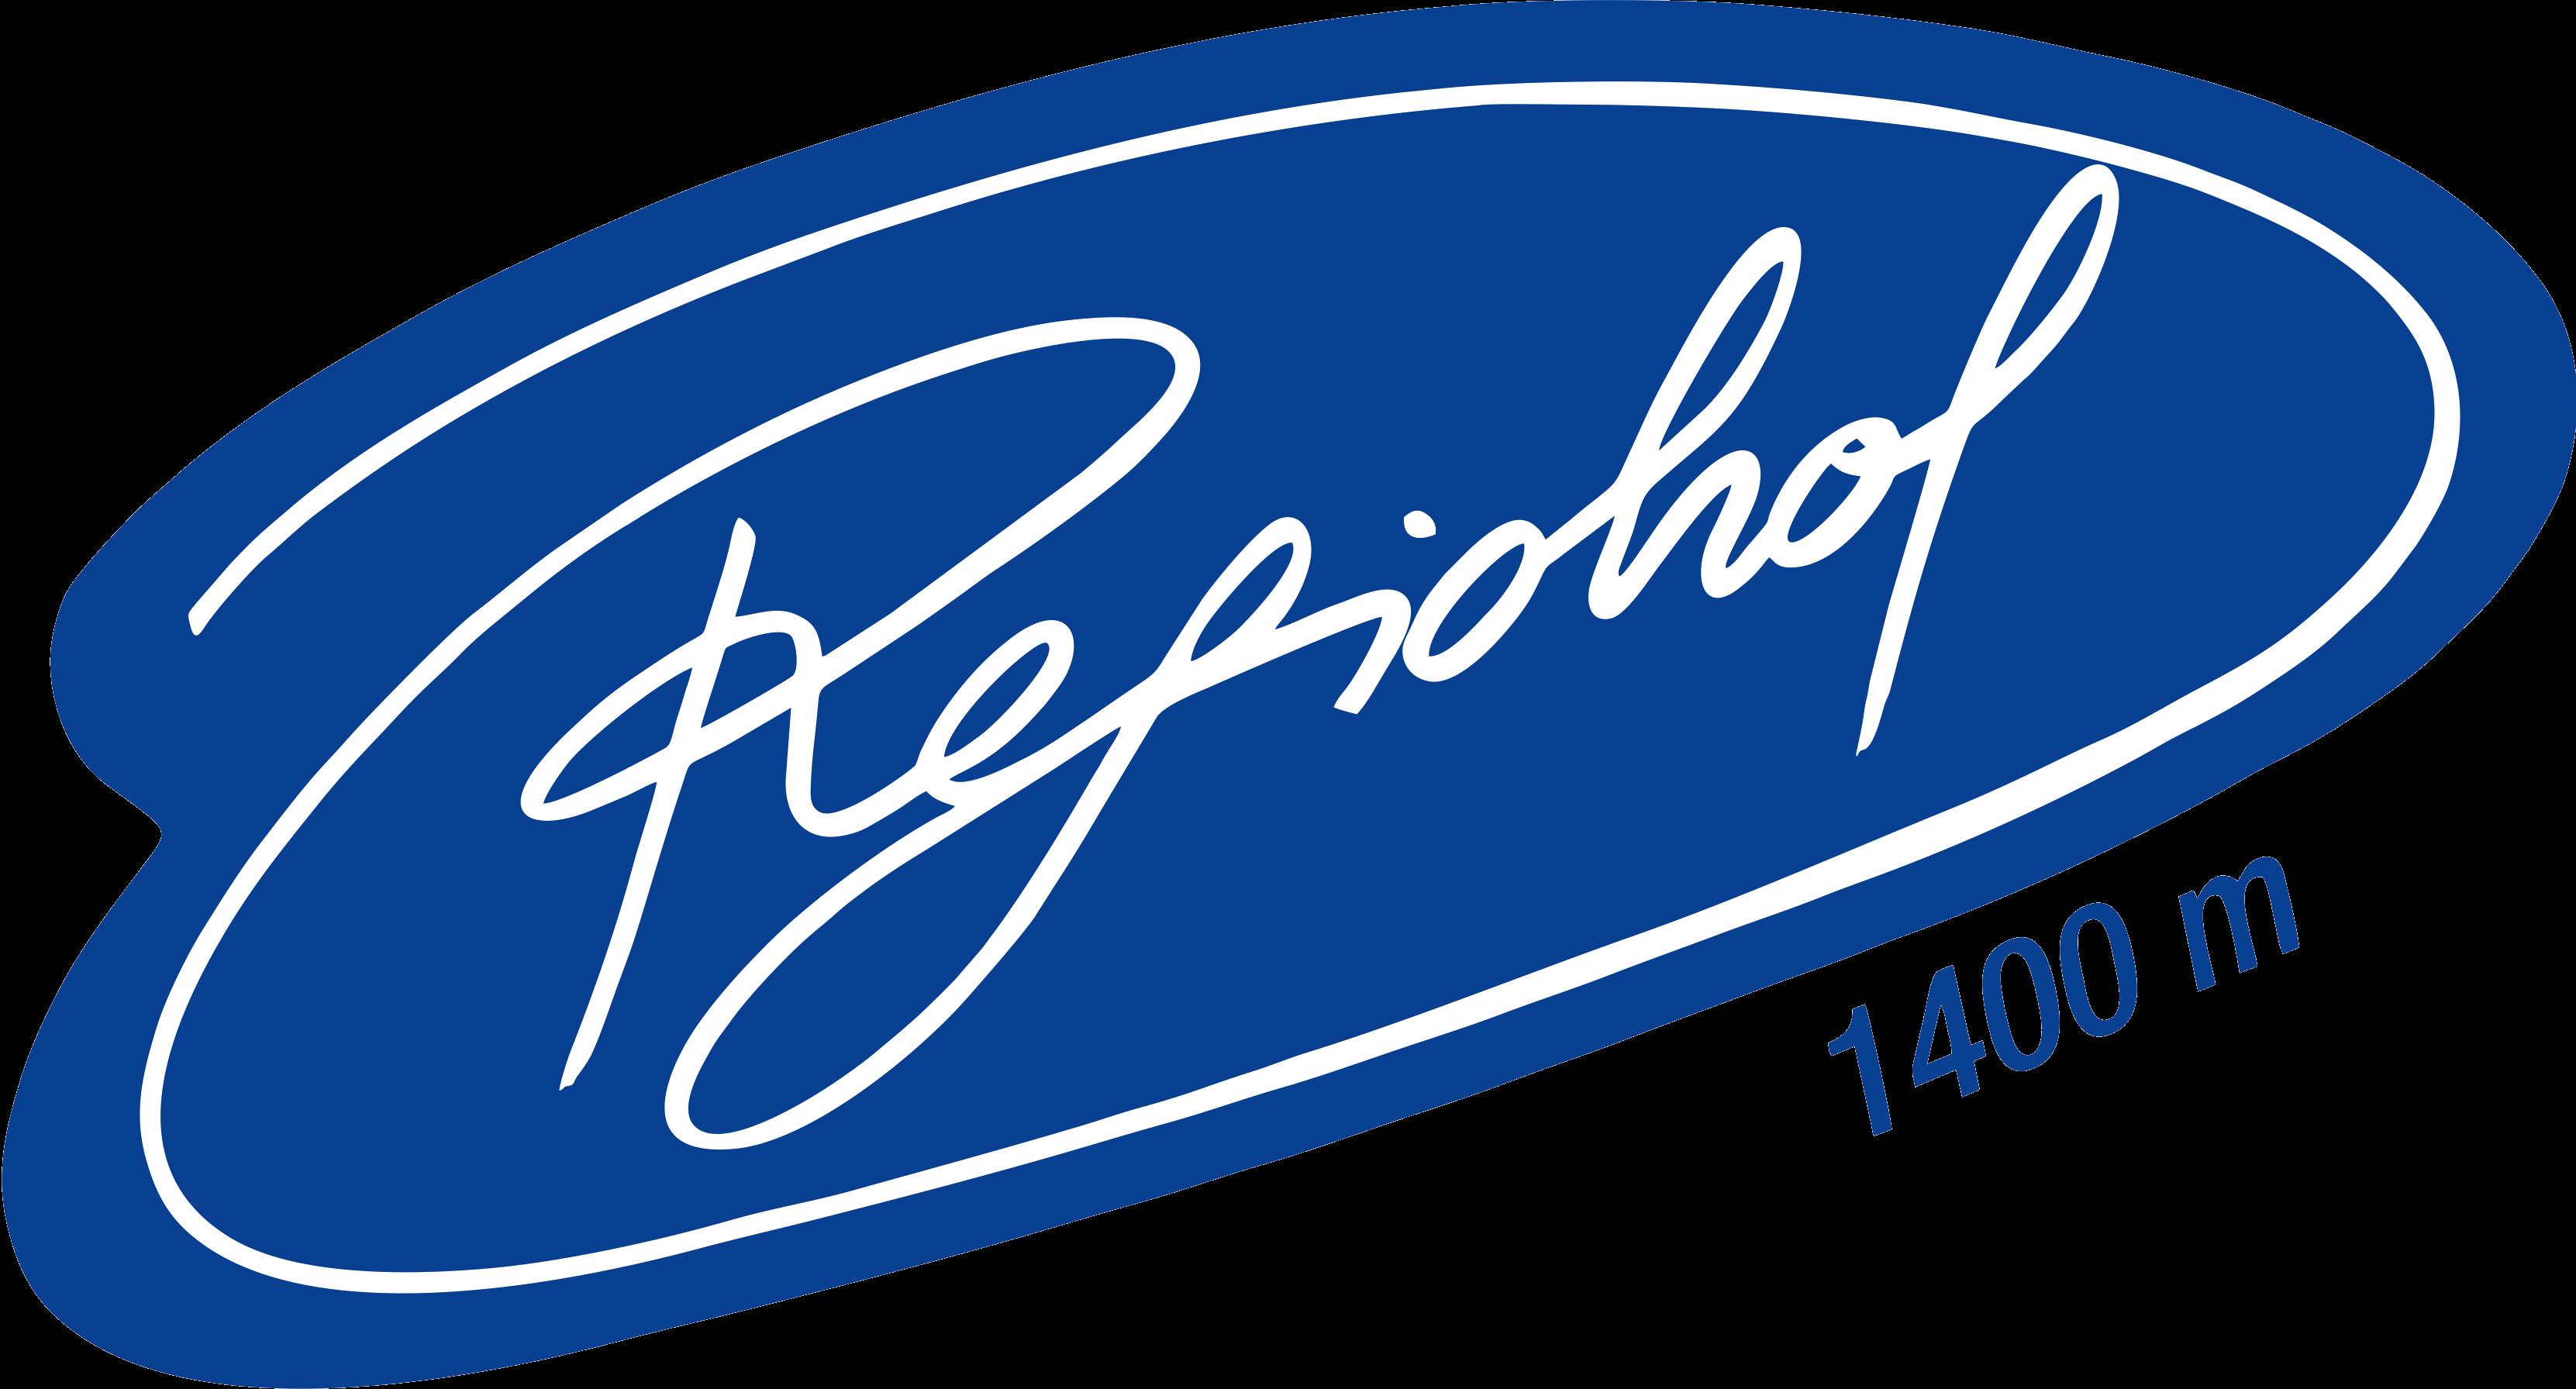 Regiohof